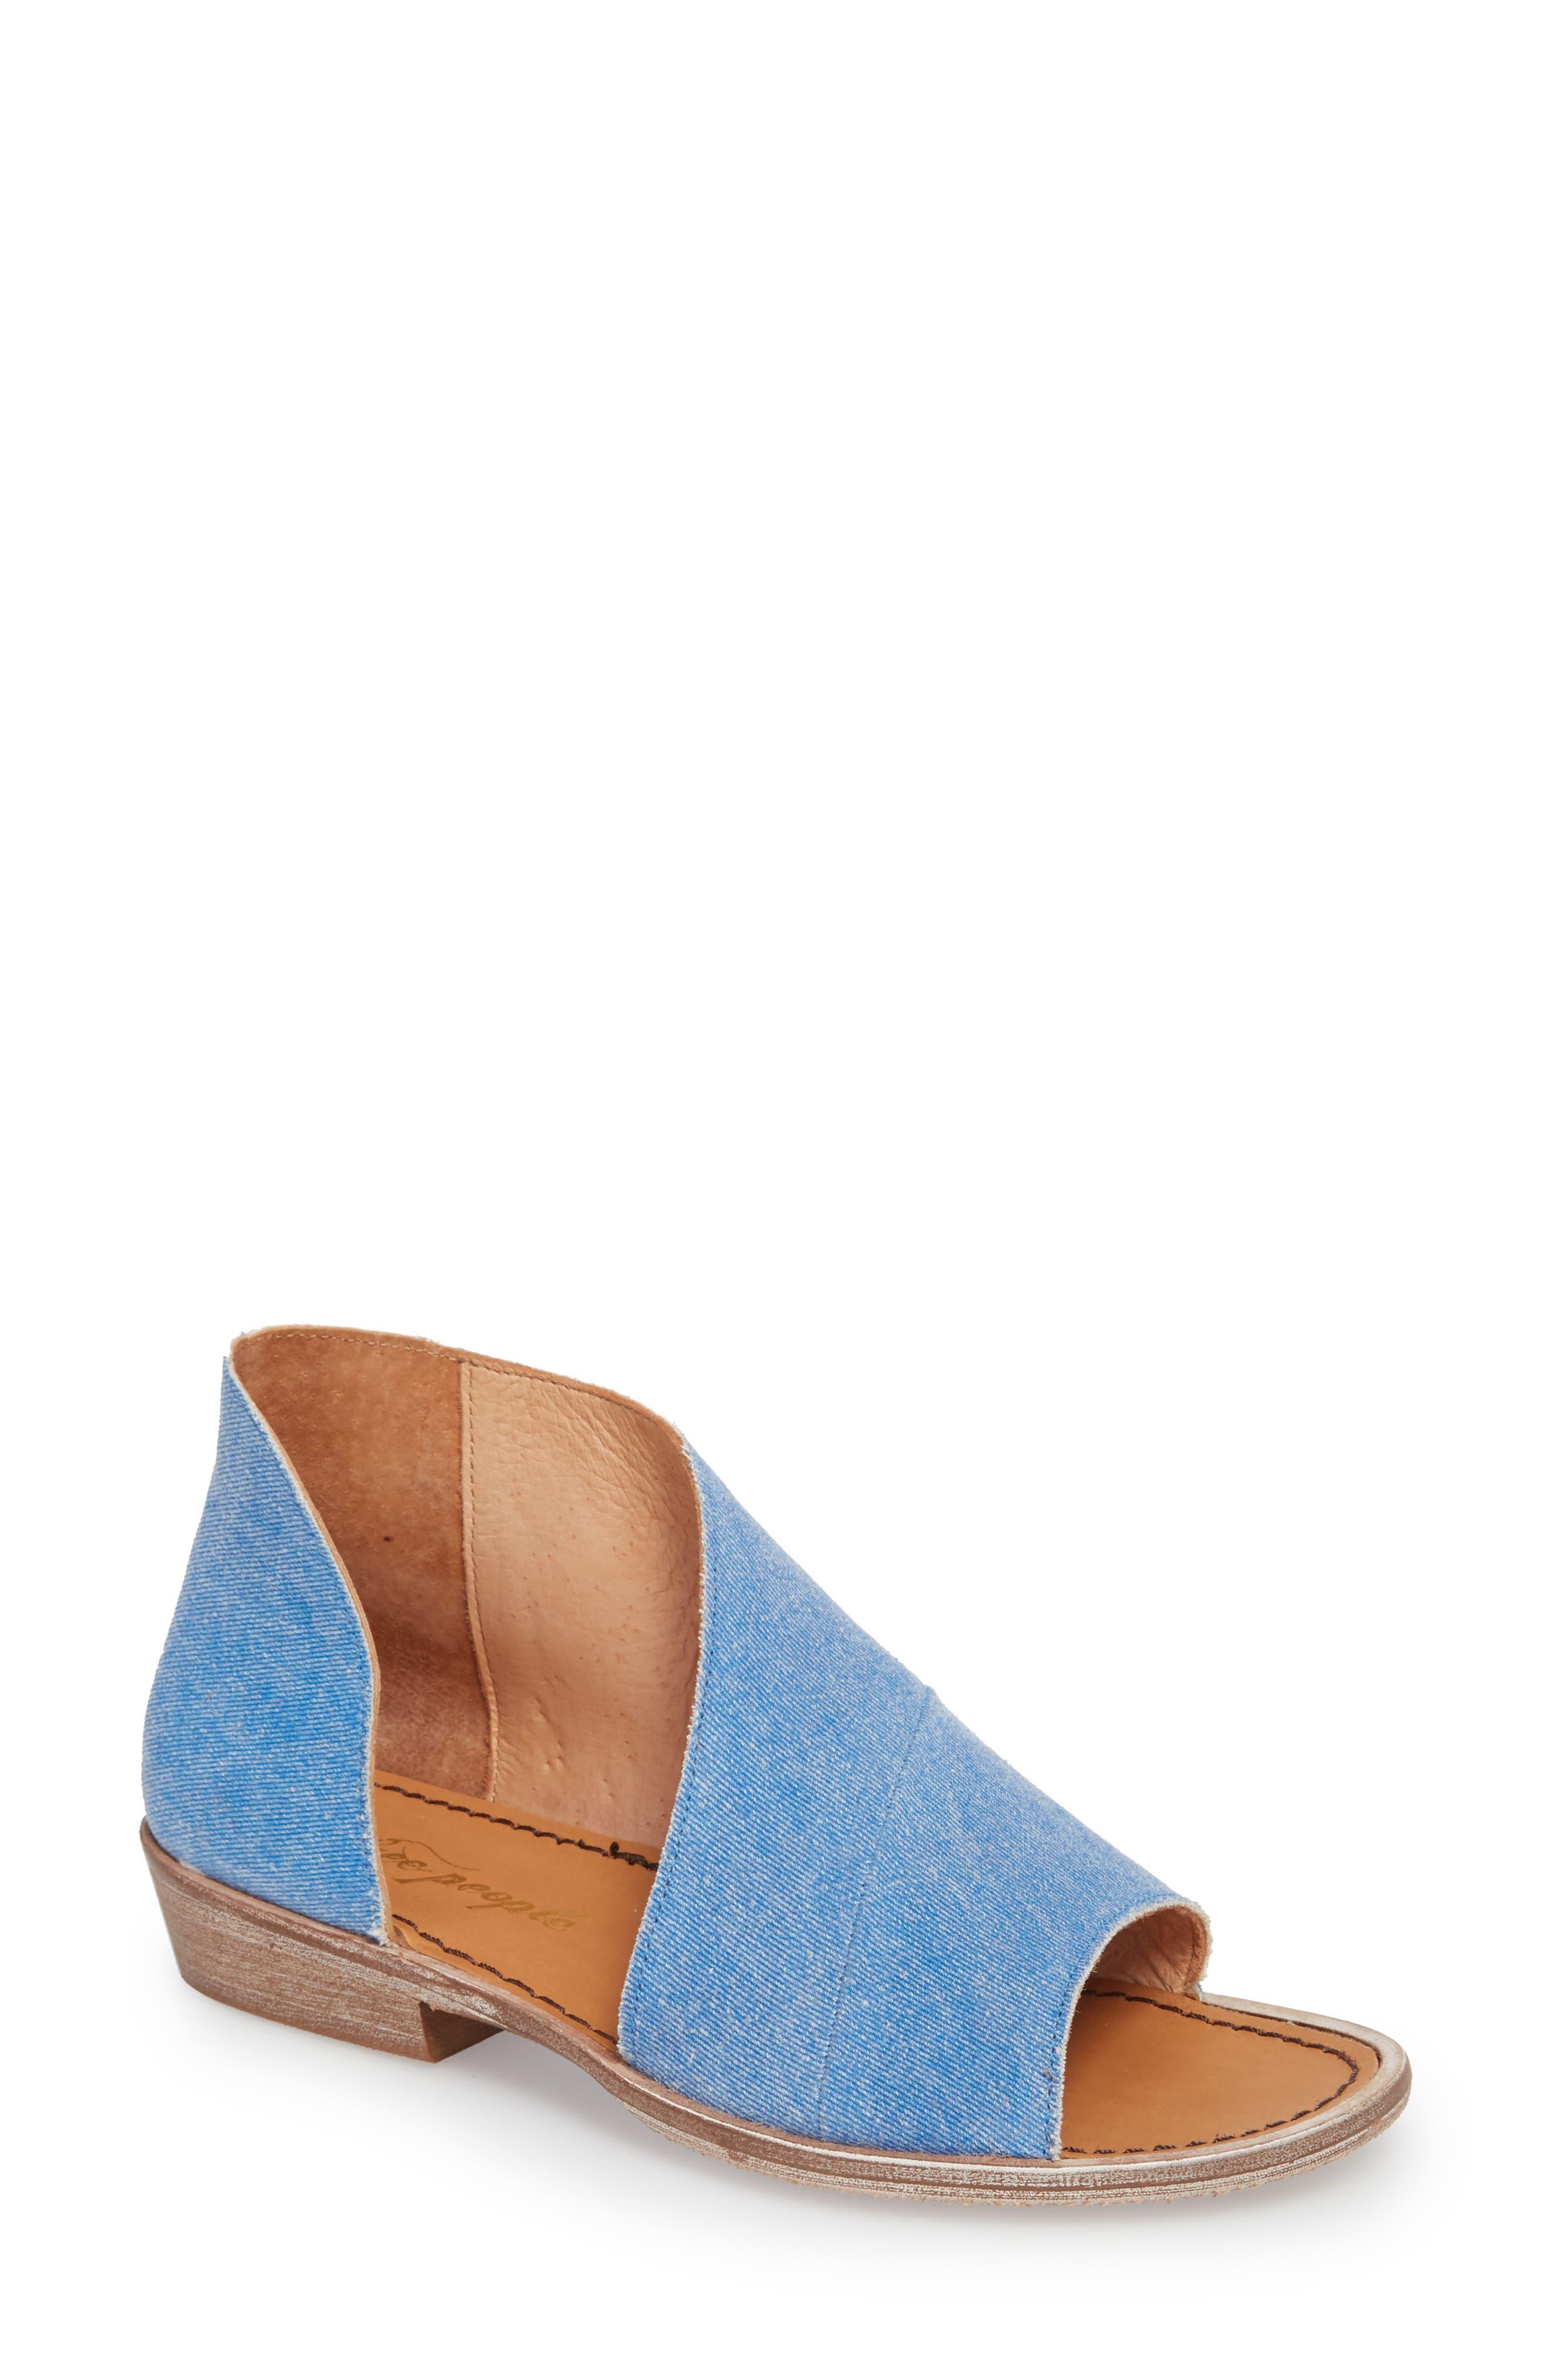 'Mont Blanc' Asymmetrical Sandal,                             Main thumbnail 5, color,